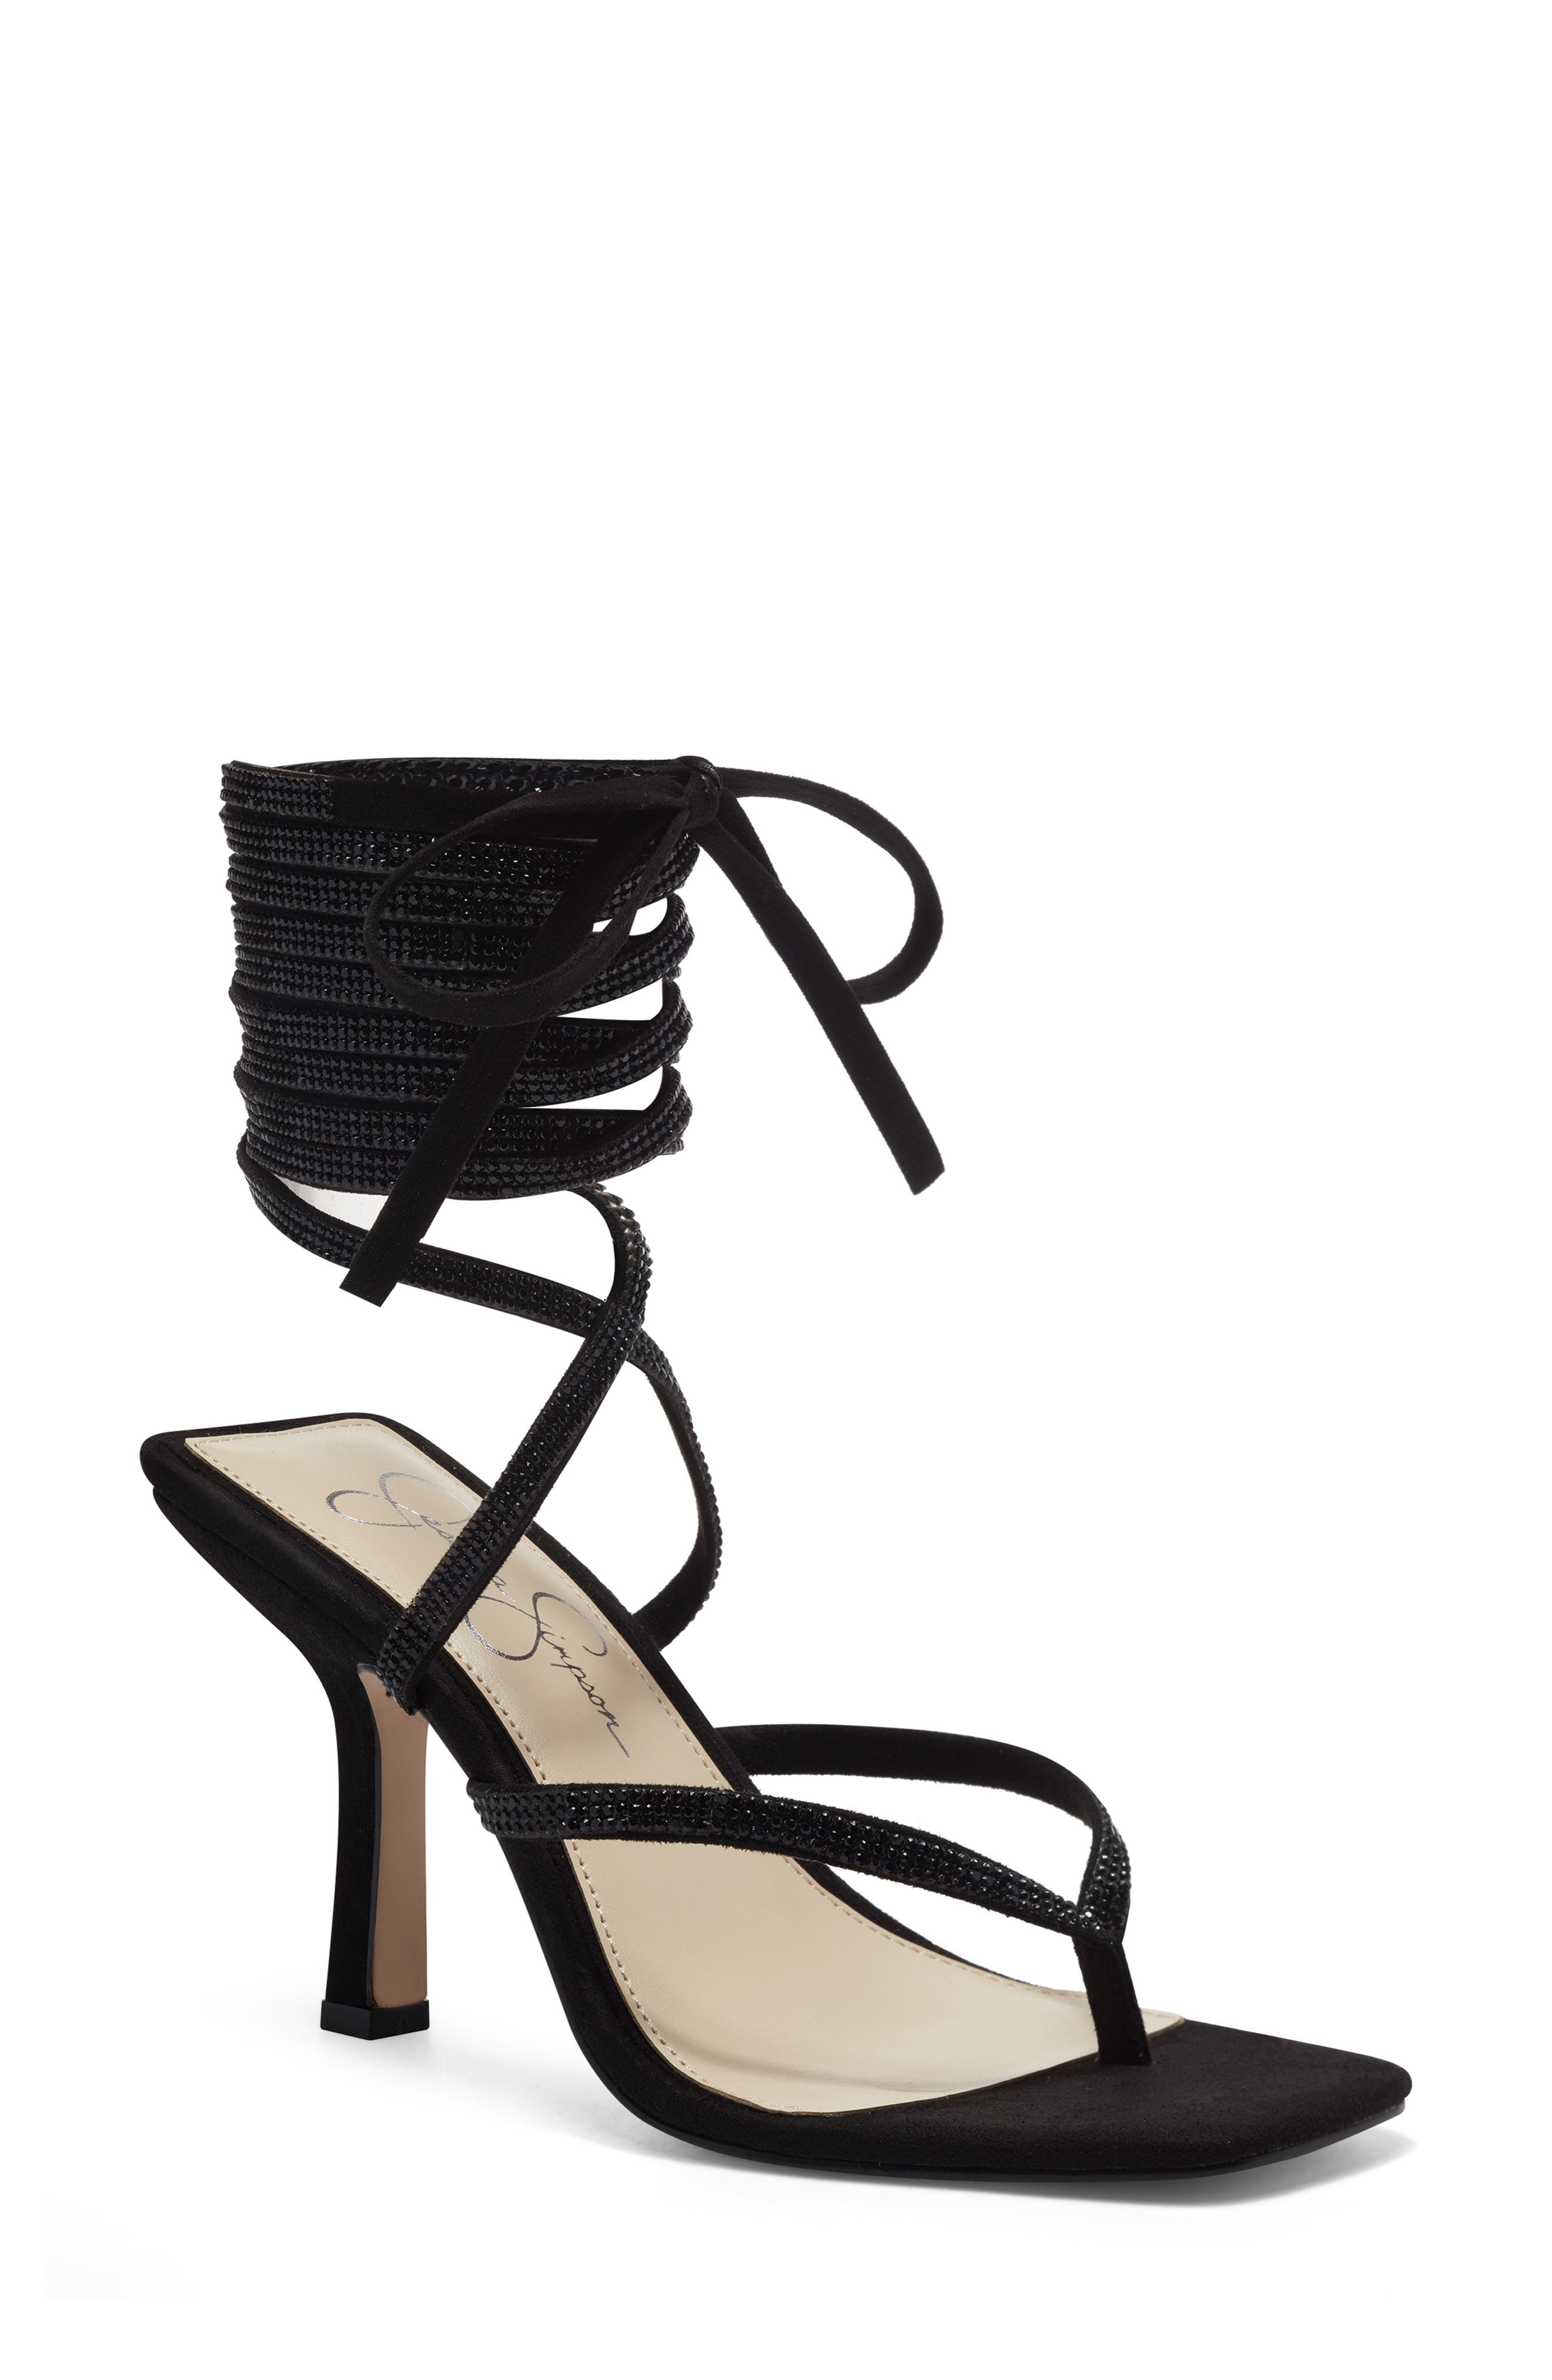 Kelsa Wraparound Sandal